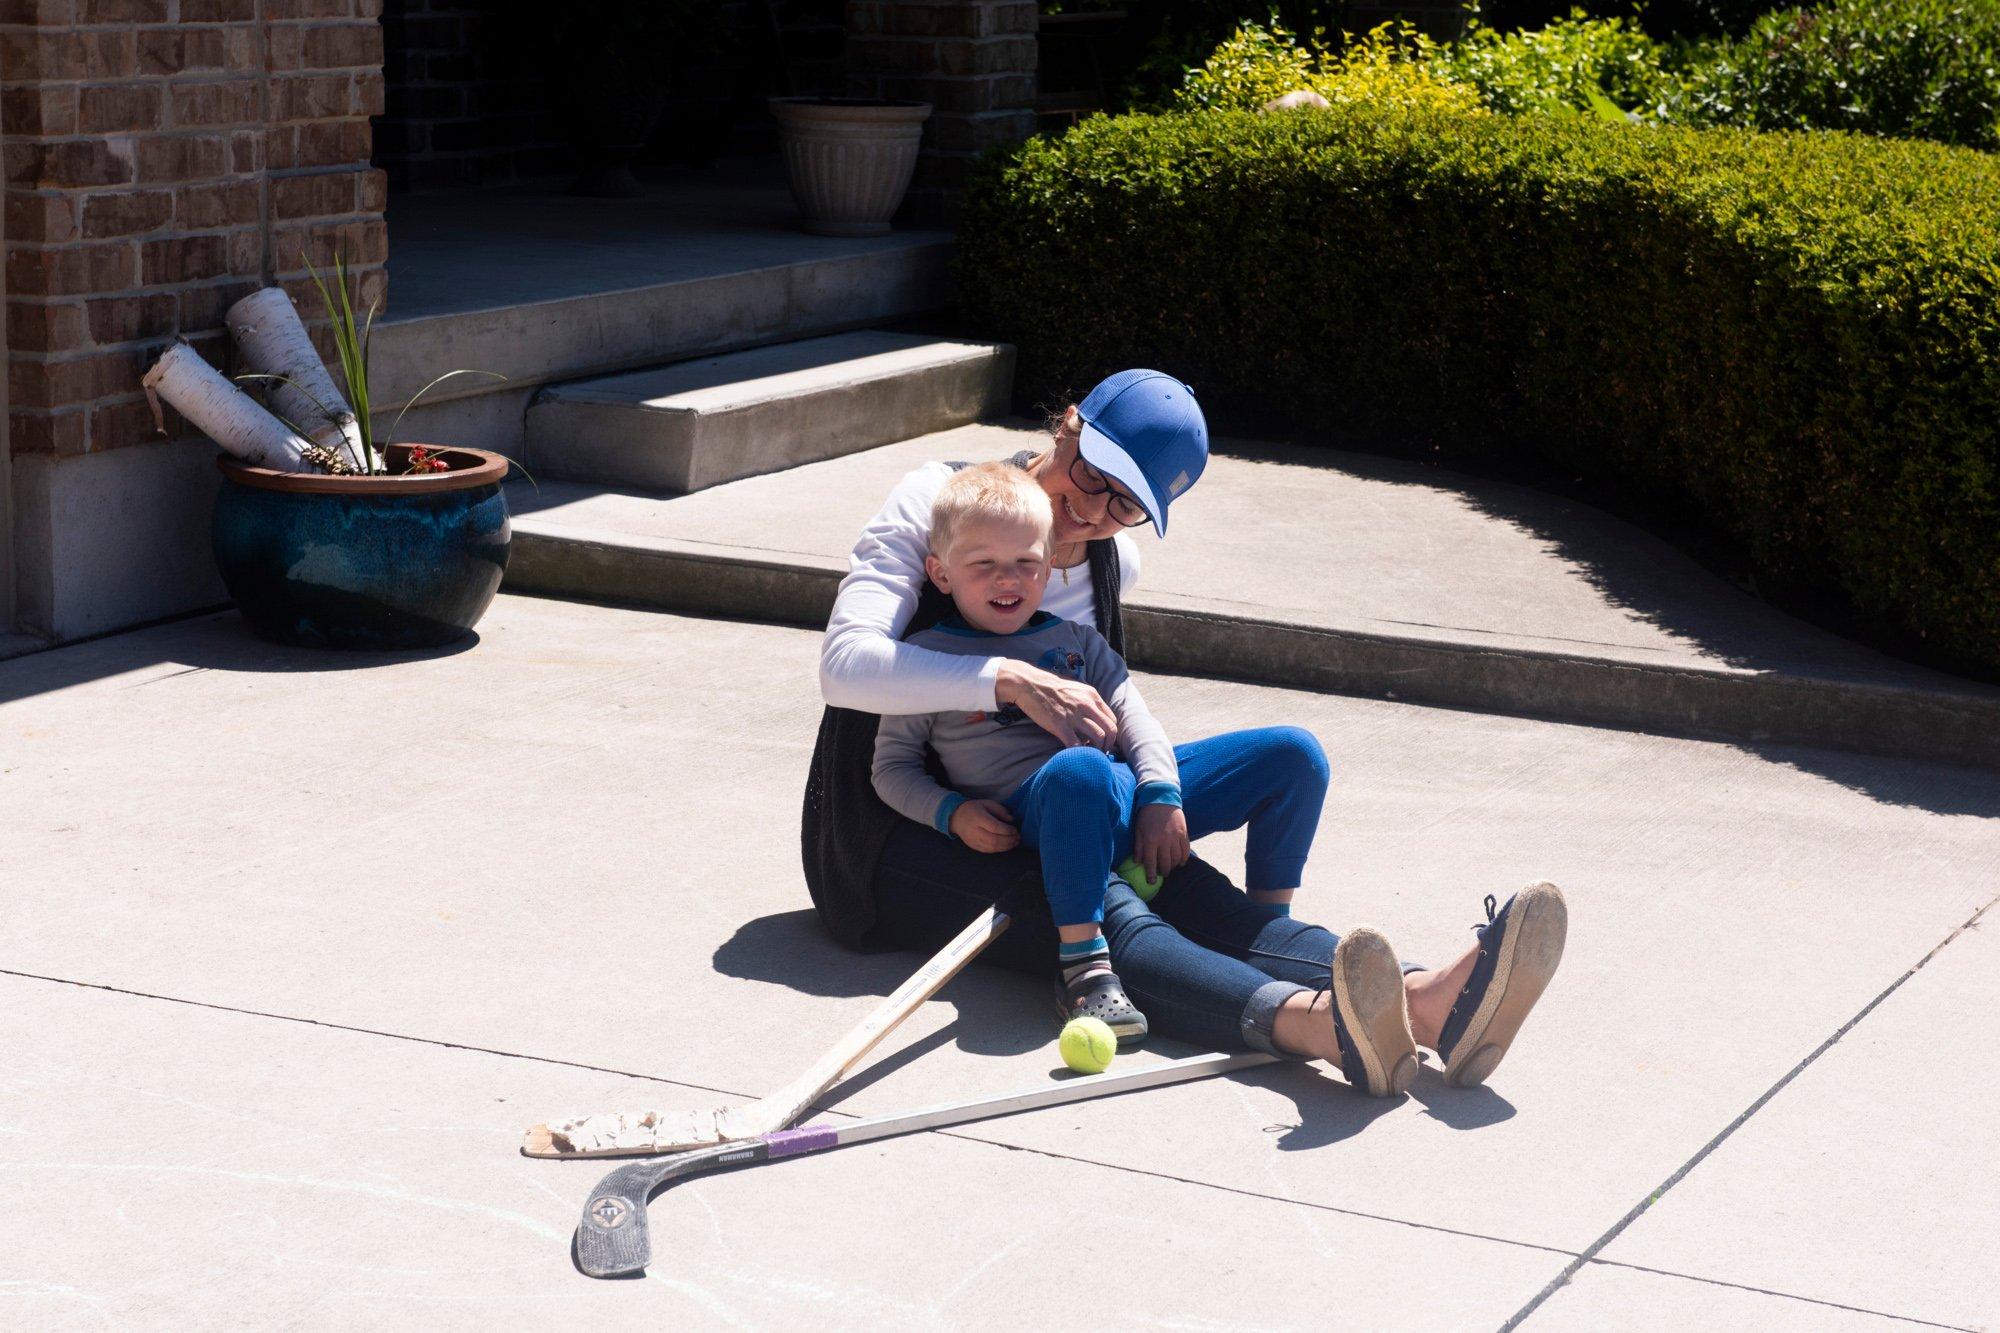 Beth Miller hugs her son Matthew (Photograph by Marta Iwanek)